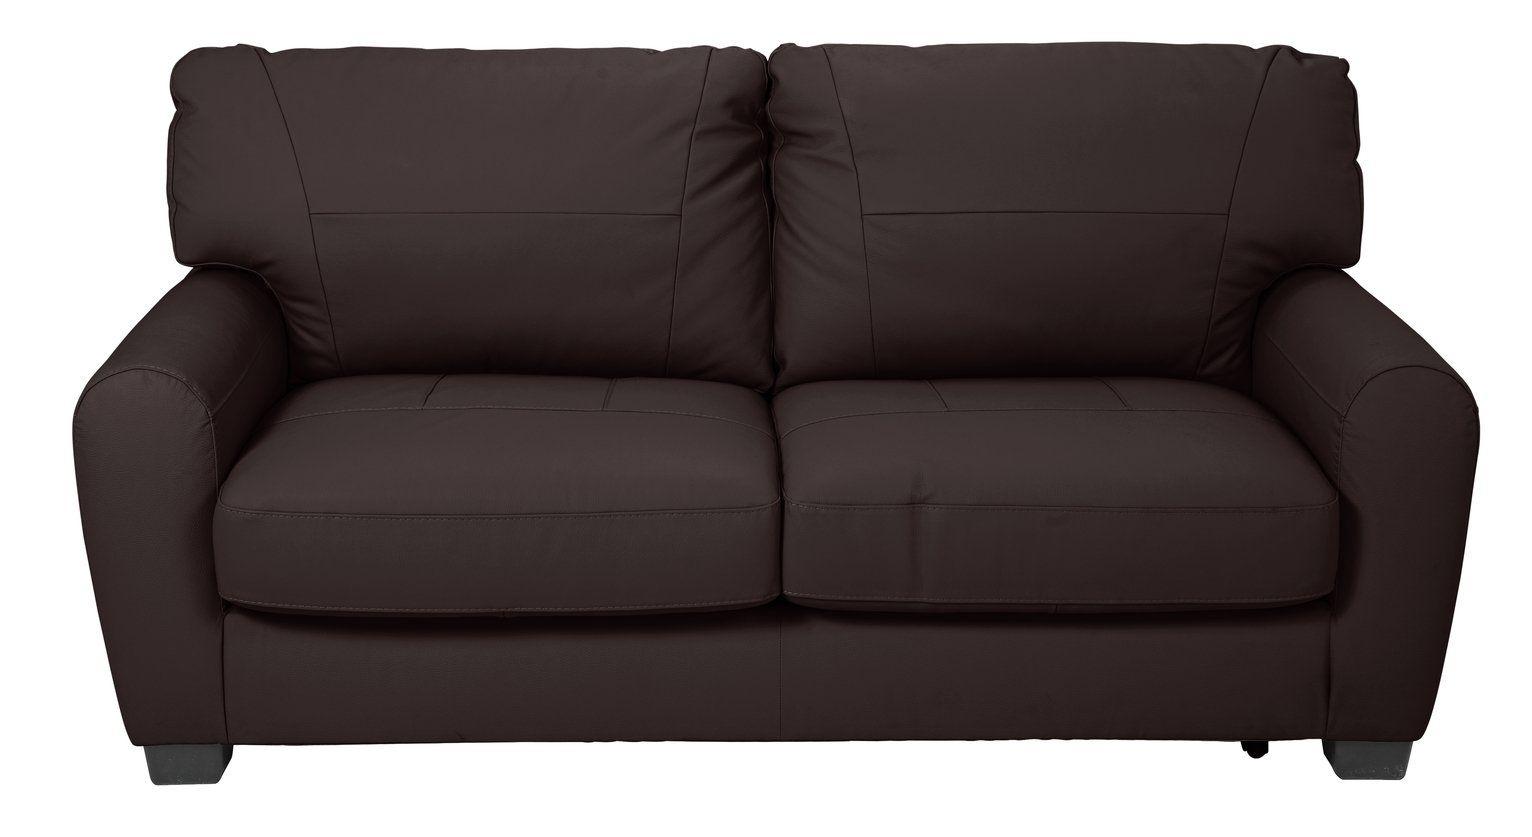 Argos Home Stefano 2 Seater Faux Leather Sofa Bed Chocolate In 2020 Leather Sofa Bed Faux Leather Sofa Leather Sofa